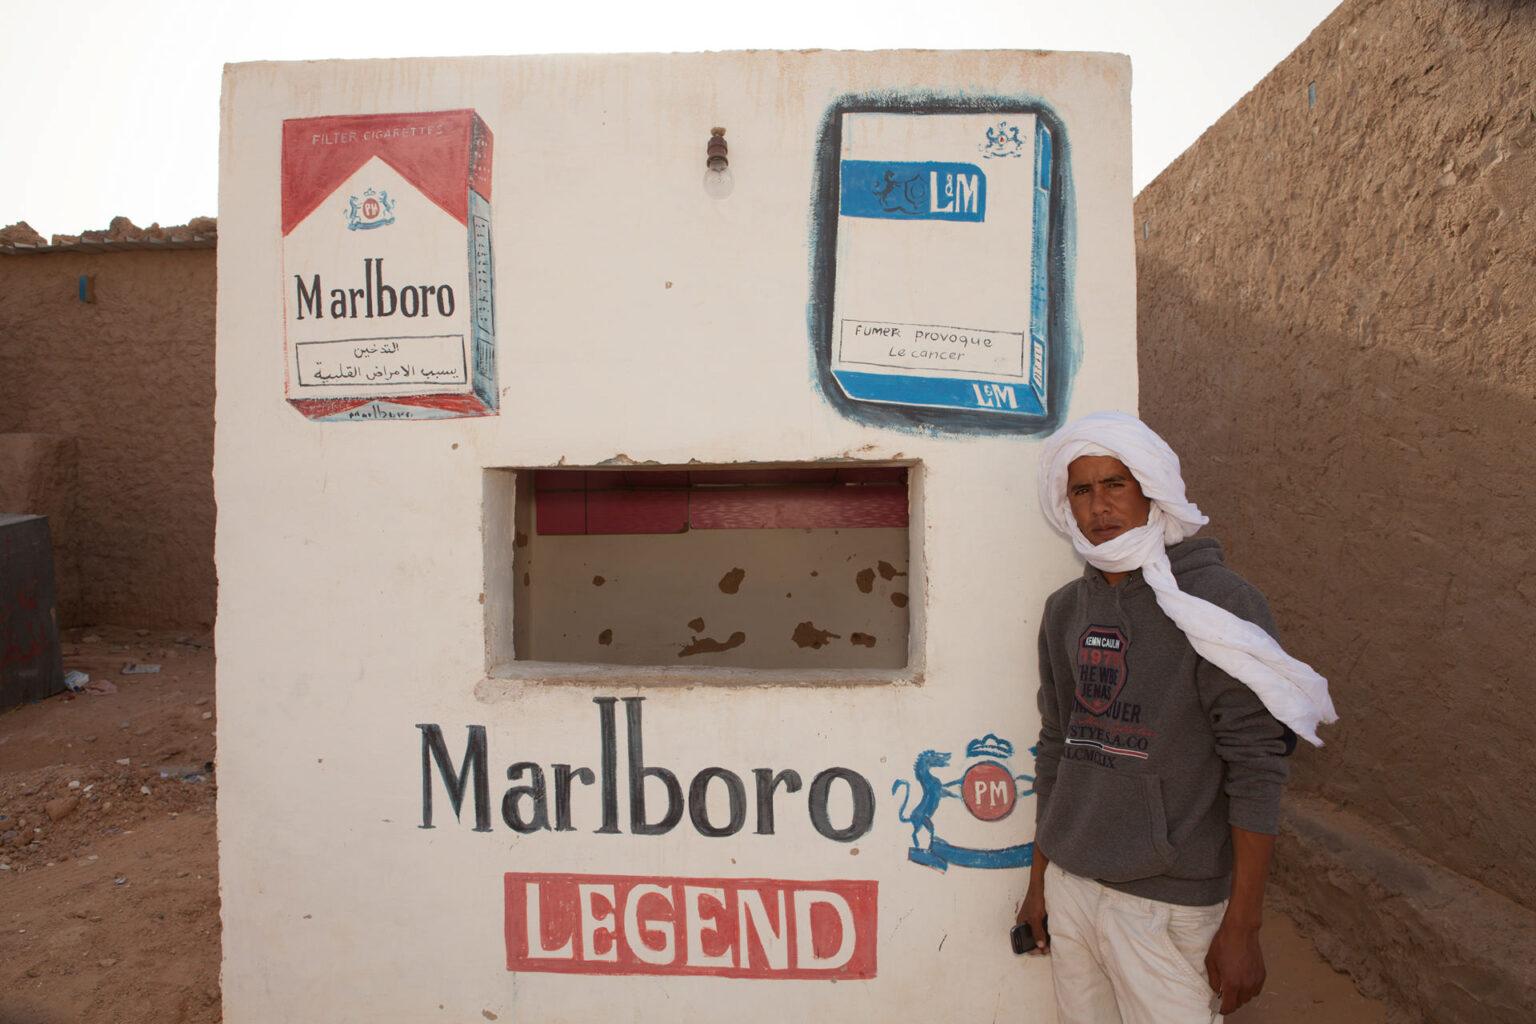 Cigarette Kiosk, Laayoune Refugee Camp, Algeria, 2015